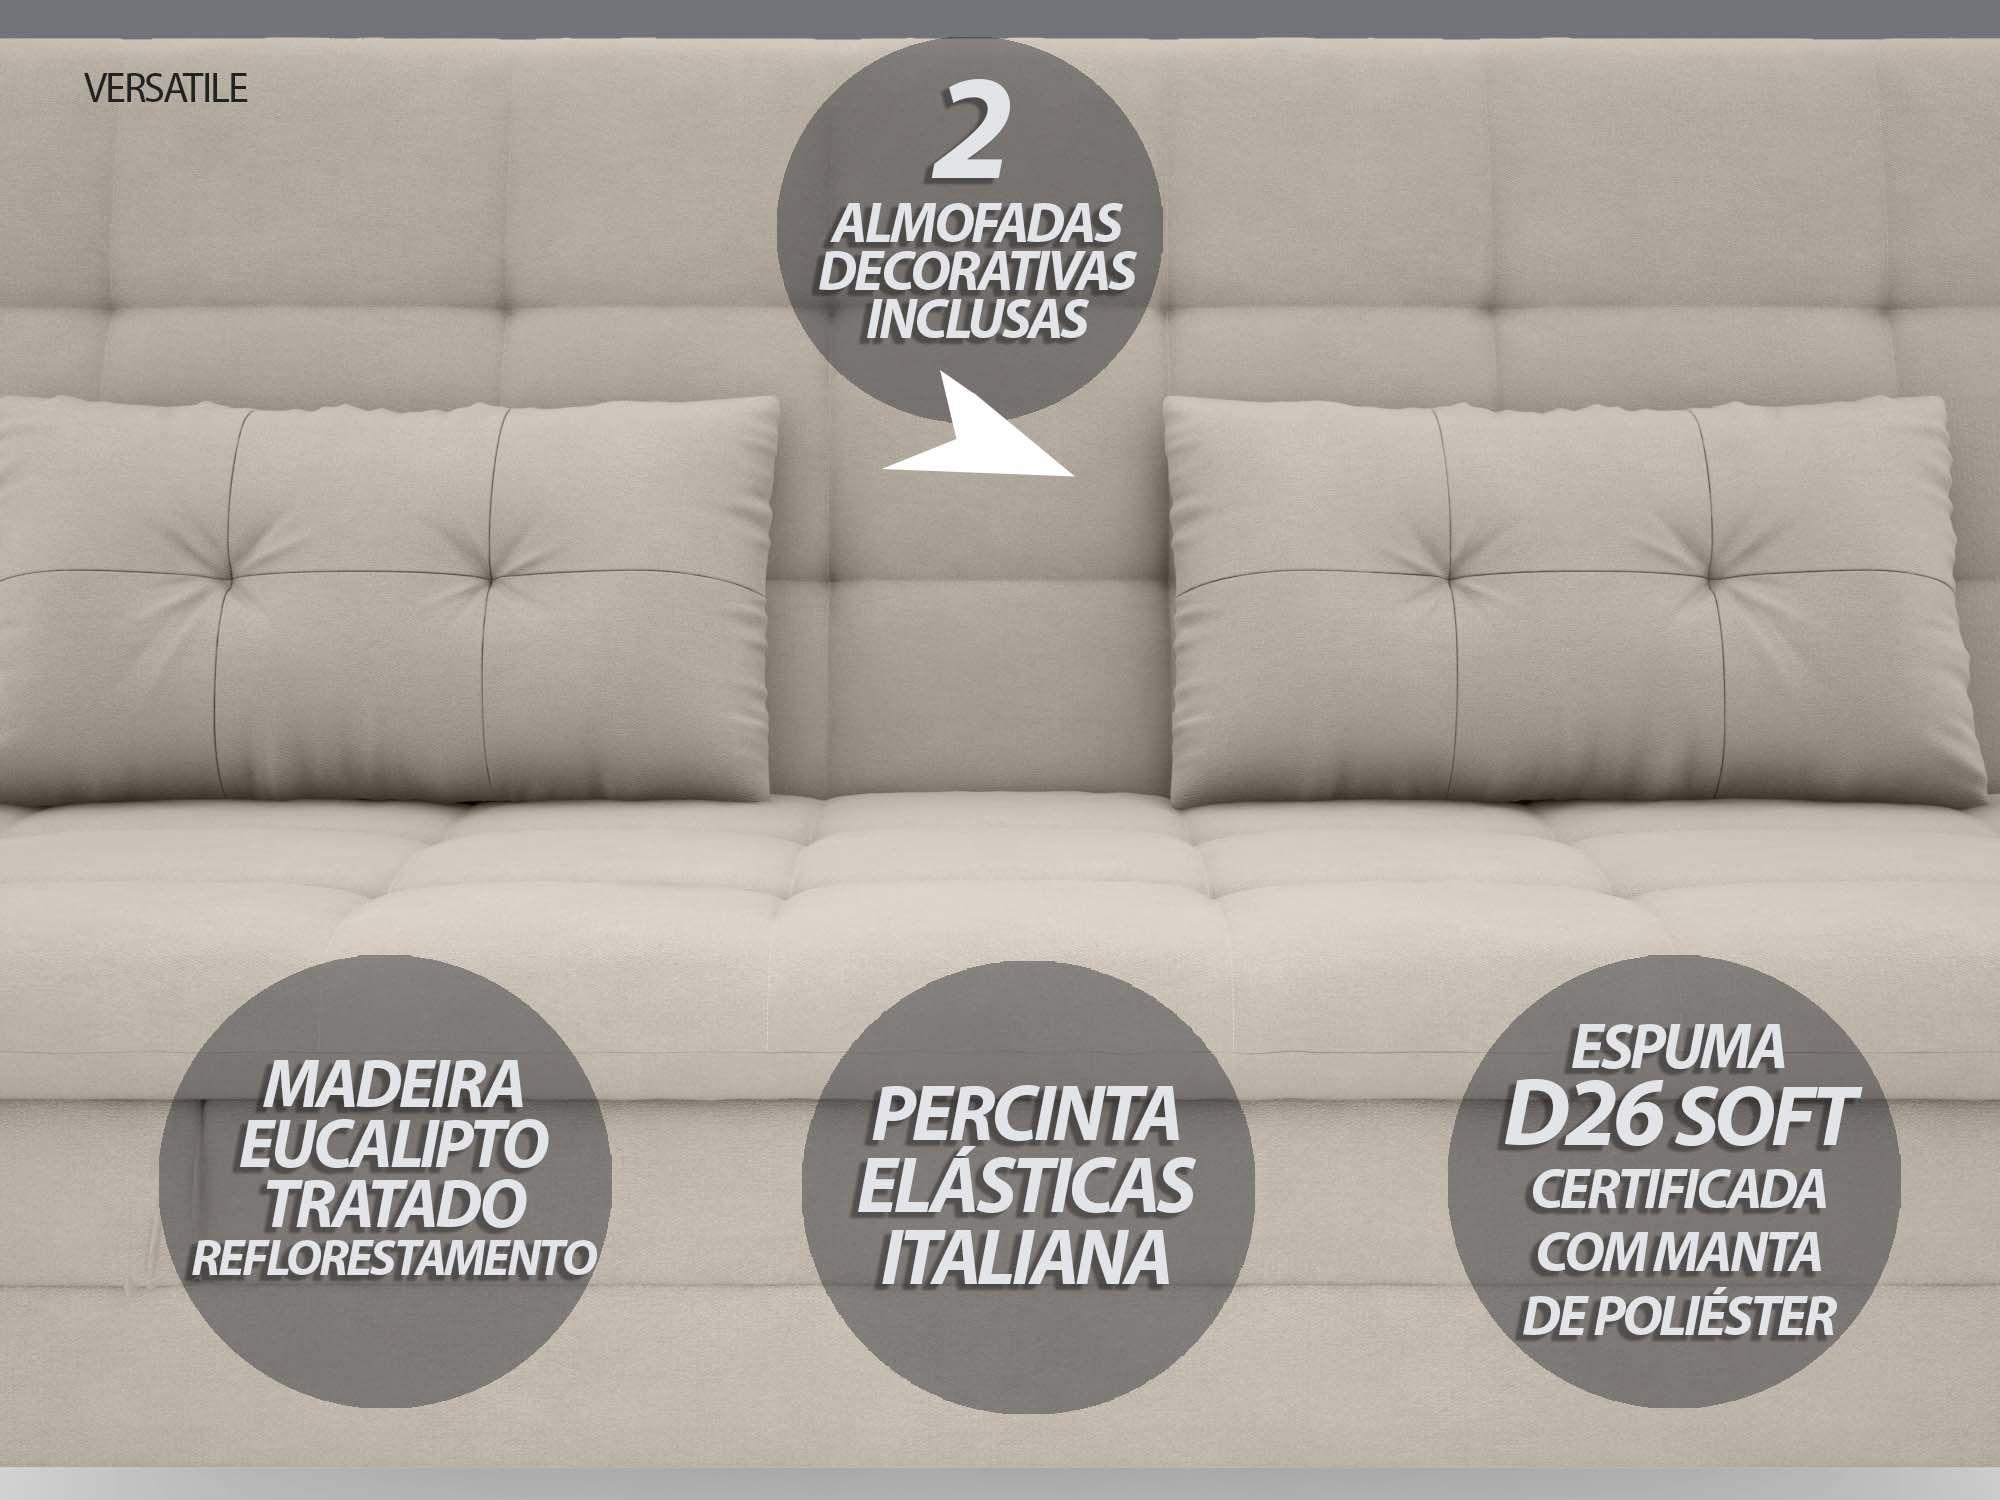 Sofá-Cama Casal New Versatile 1,94m Velosuede Areia - NETSOFAS